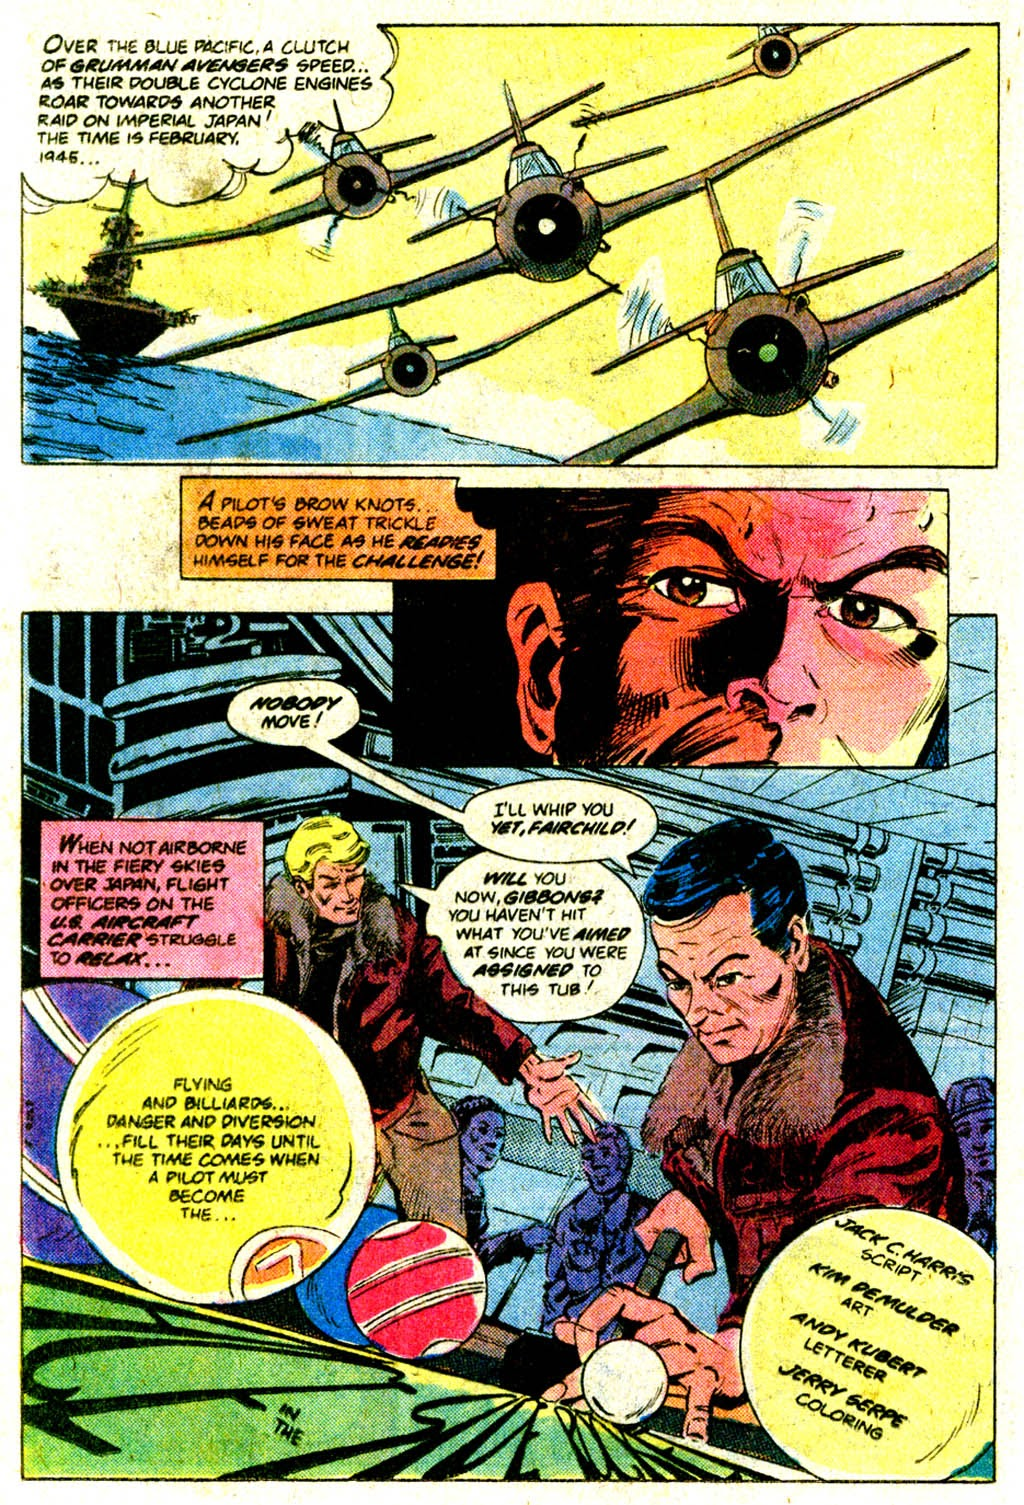 Read online Sgt. Rock comic -  Issue #370 - 20